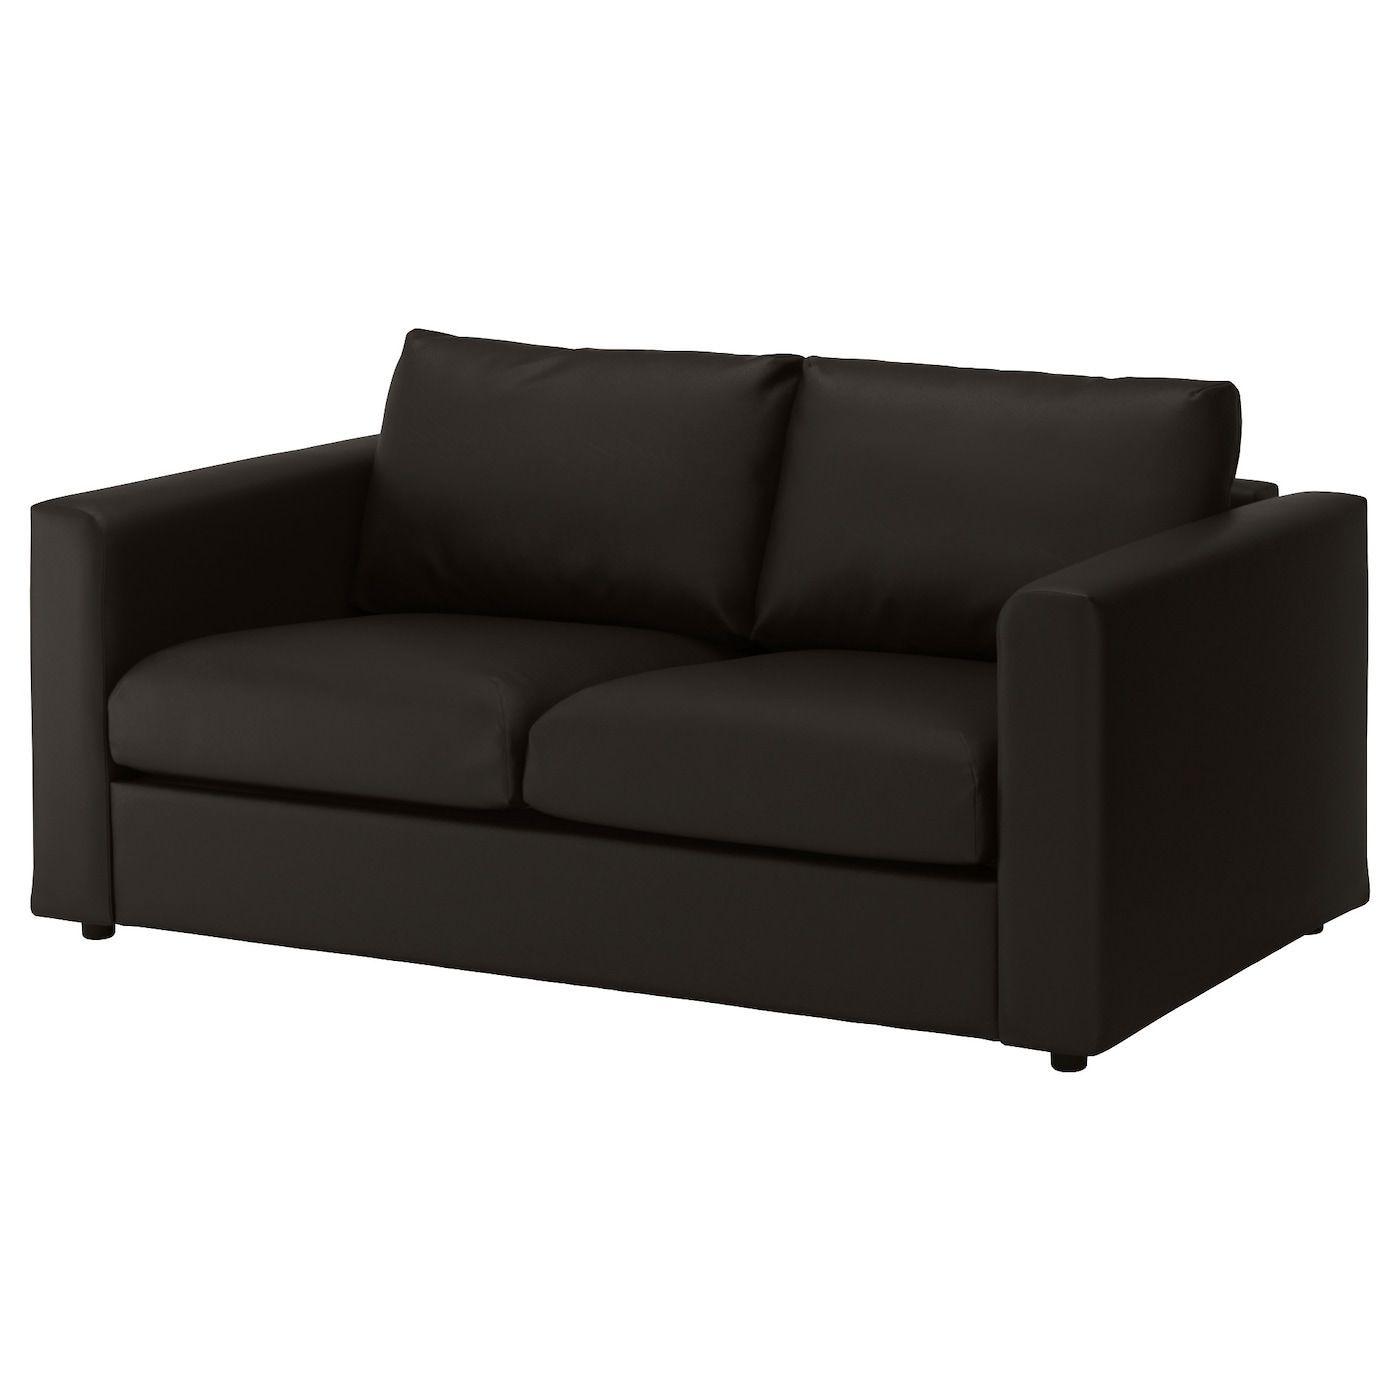 Vimle 2 Sitzer Sofa 2020